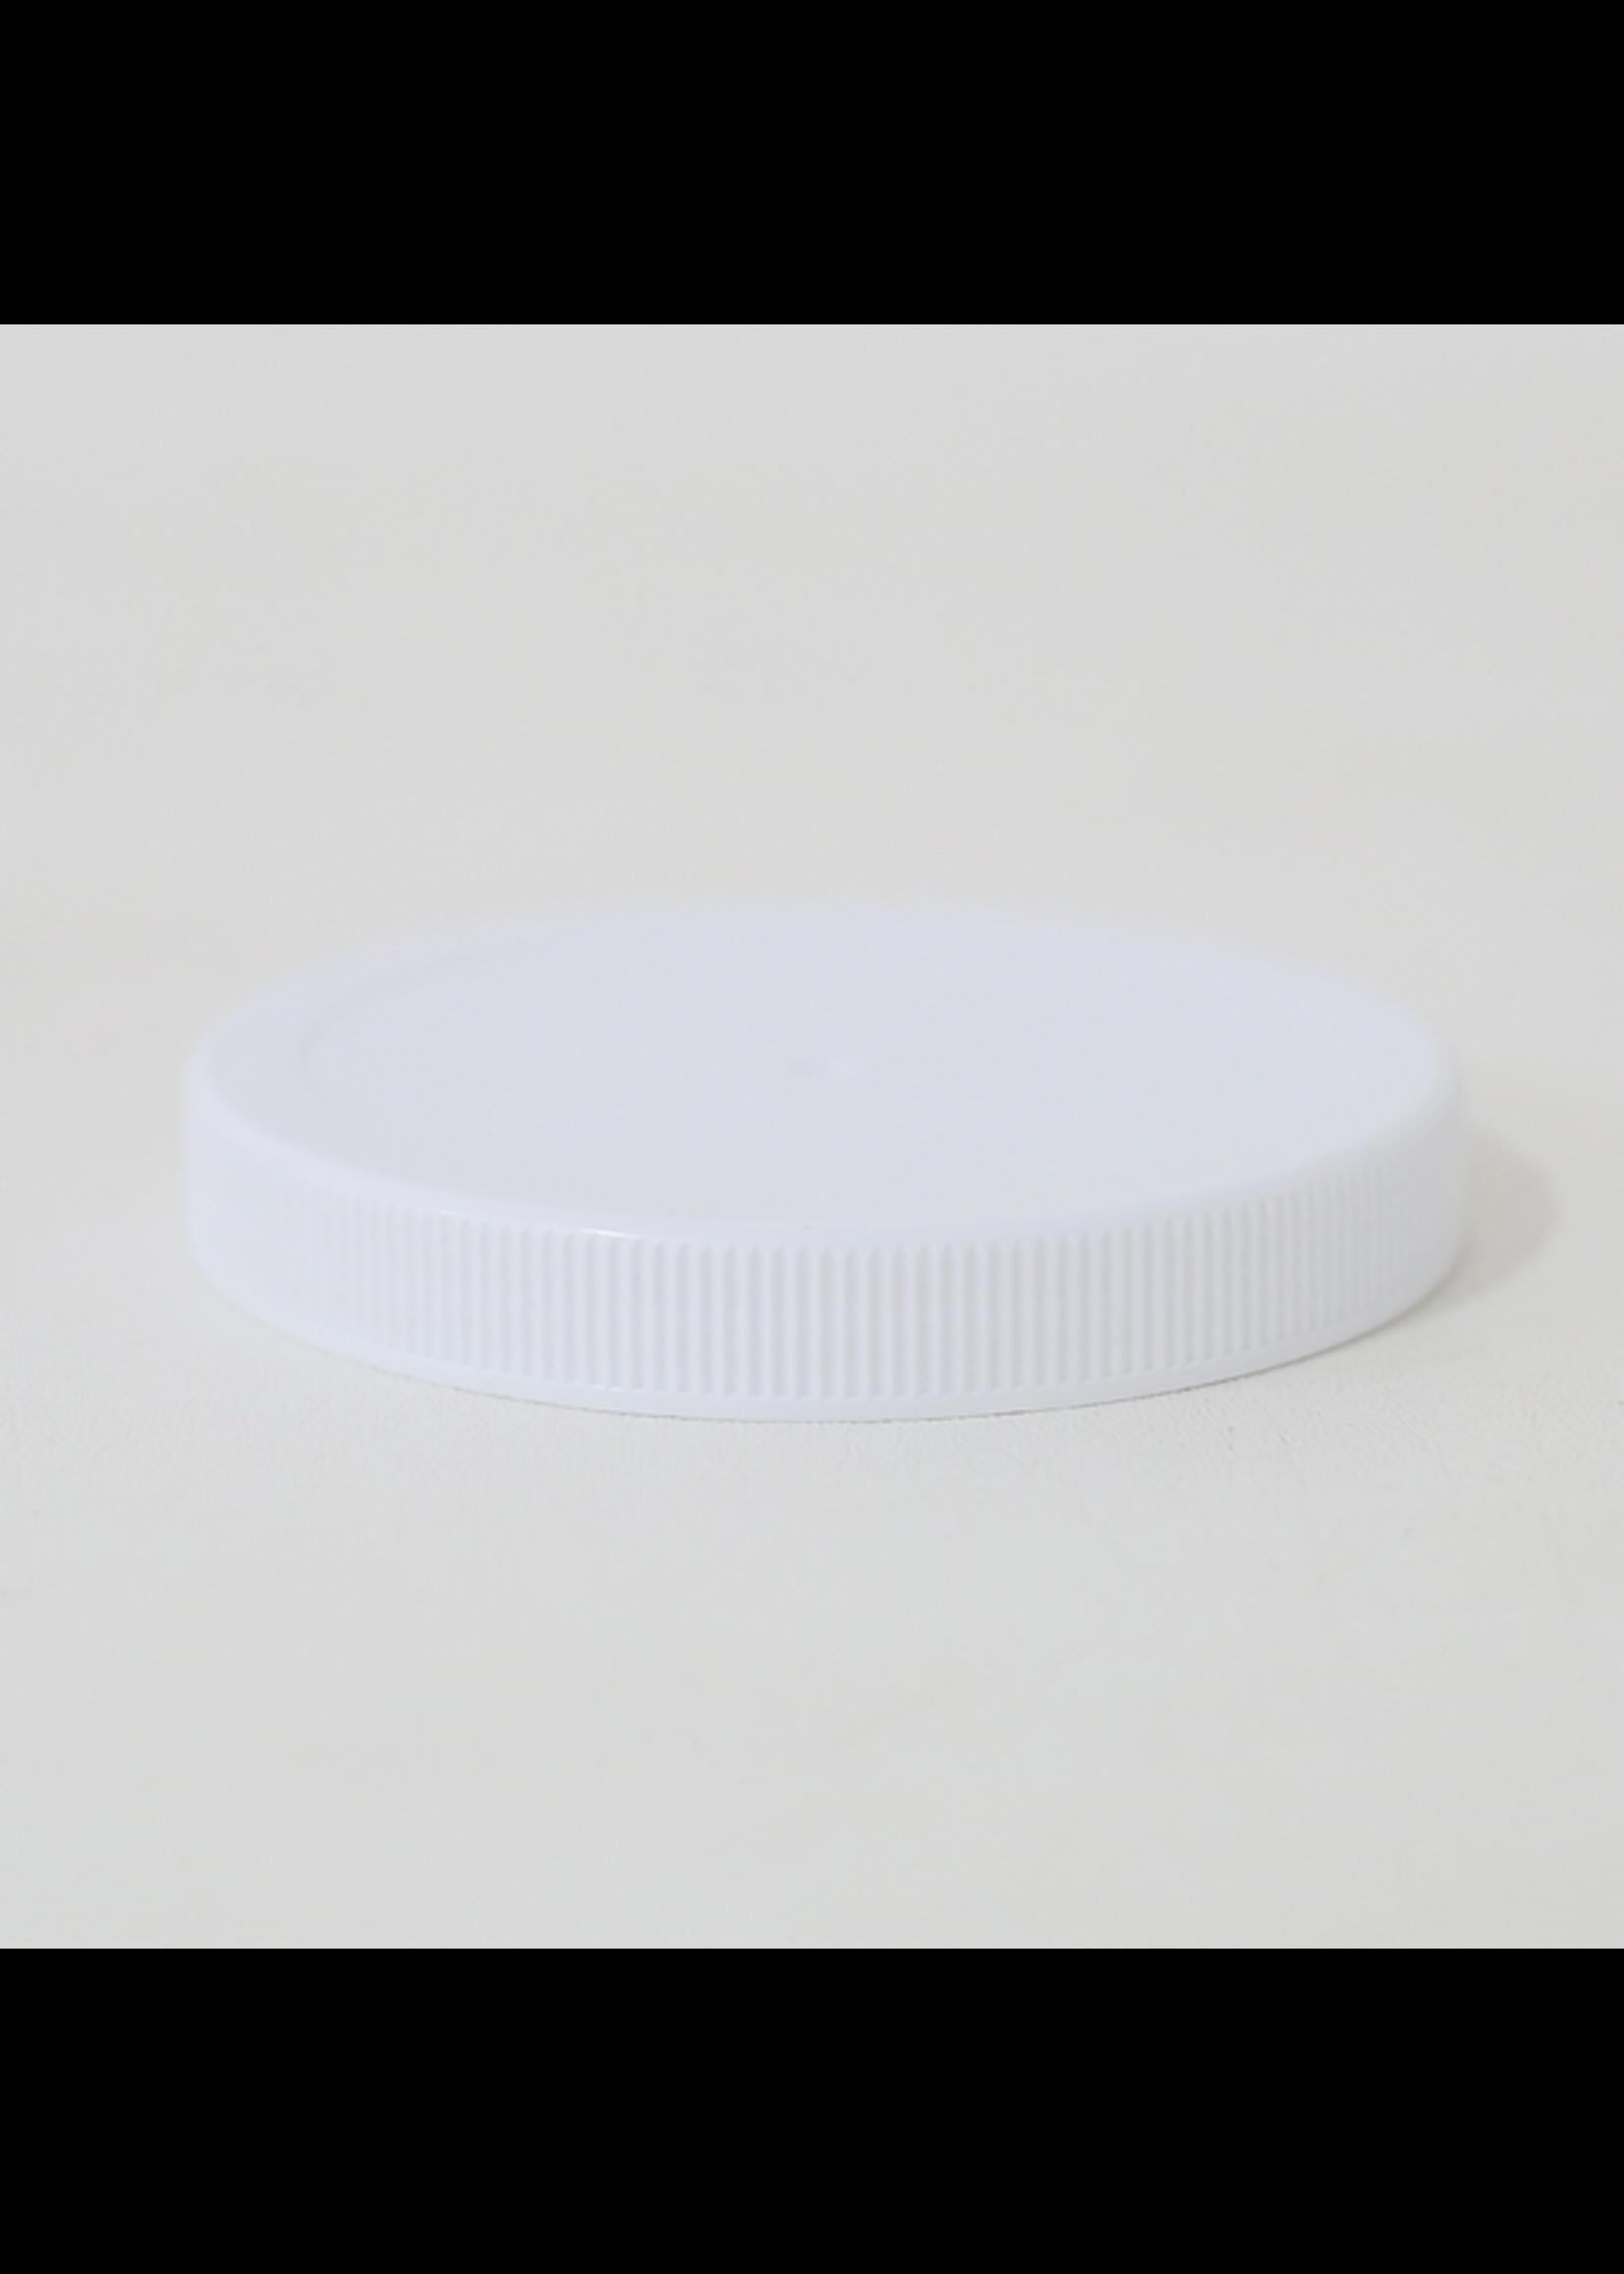 Fermentation Plastic Lid For One Gallon Fermentation Glass Jar